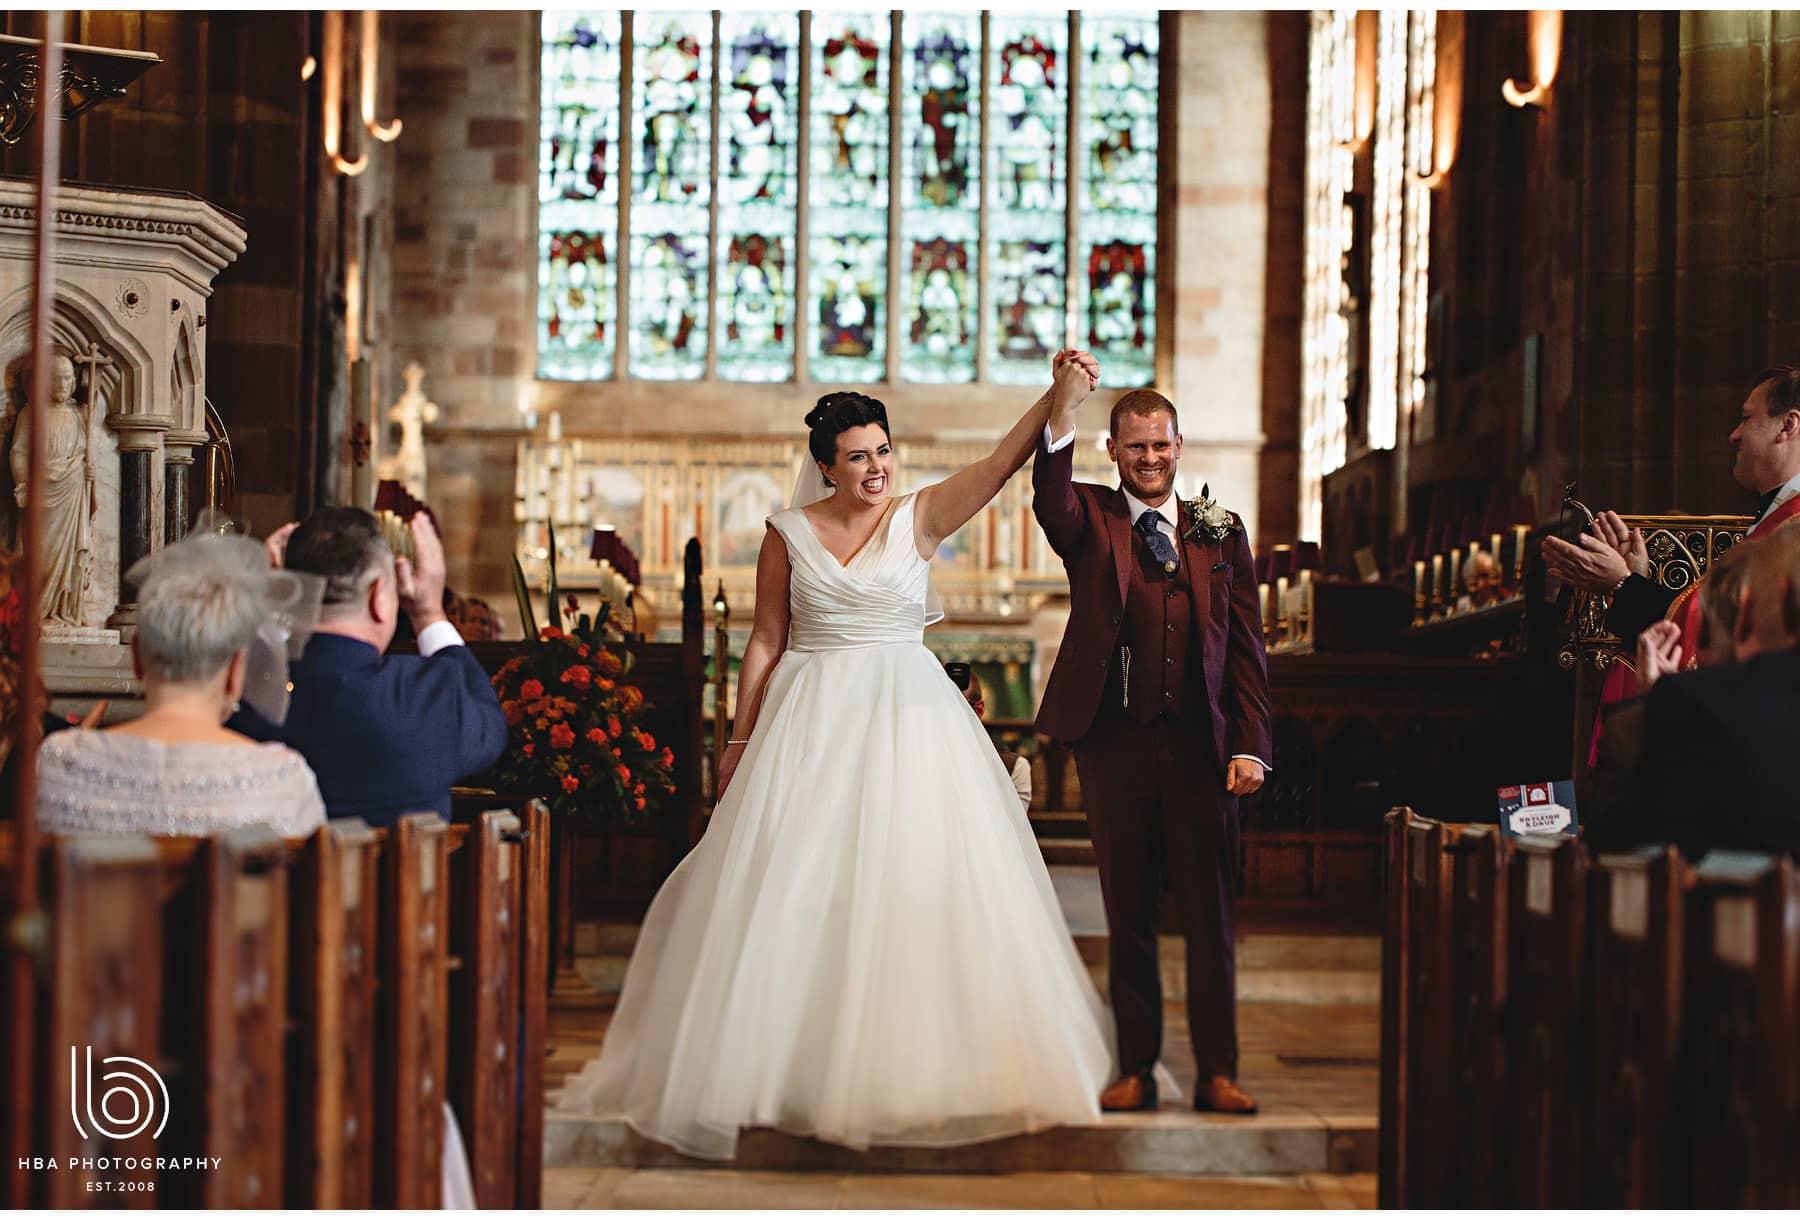 Osmaston_Park_Alternative_Wedding_Photos_Autumn_